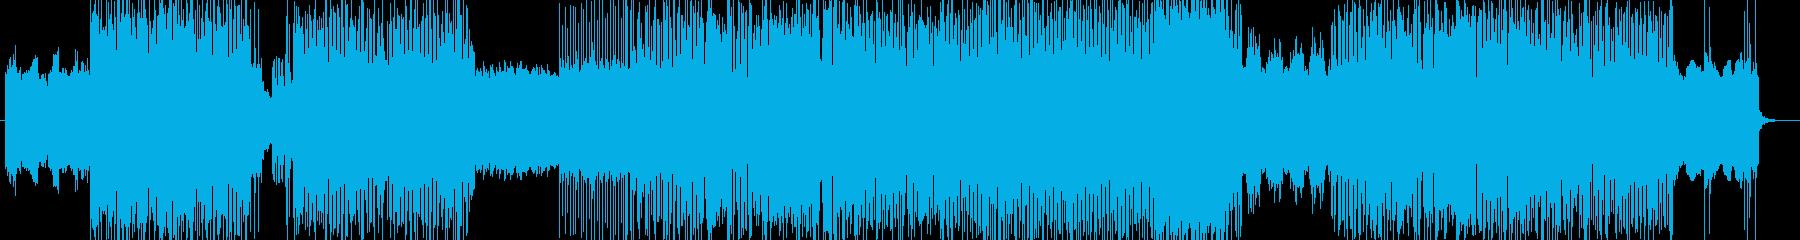 「HR/HM」「DEAD」BGM96の再生済みの波形